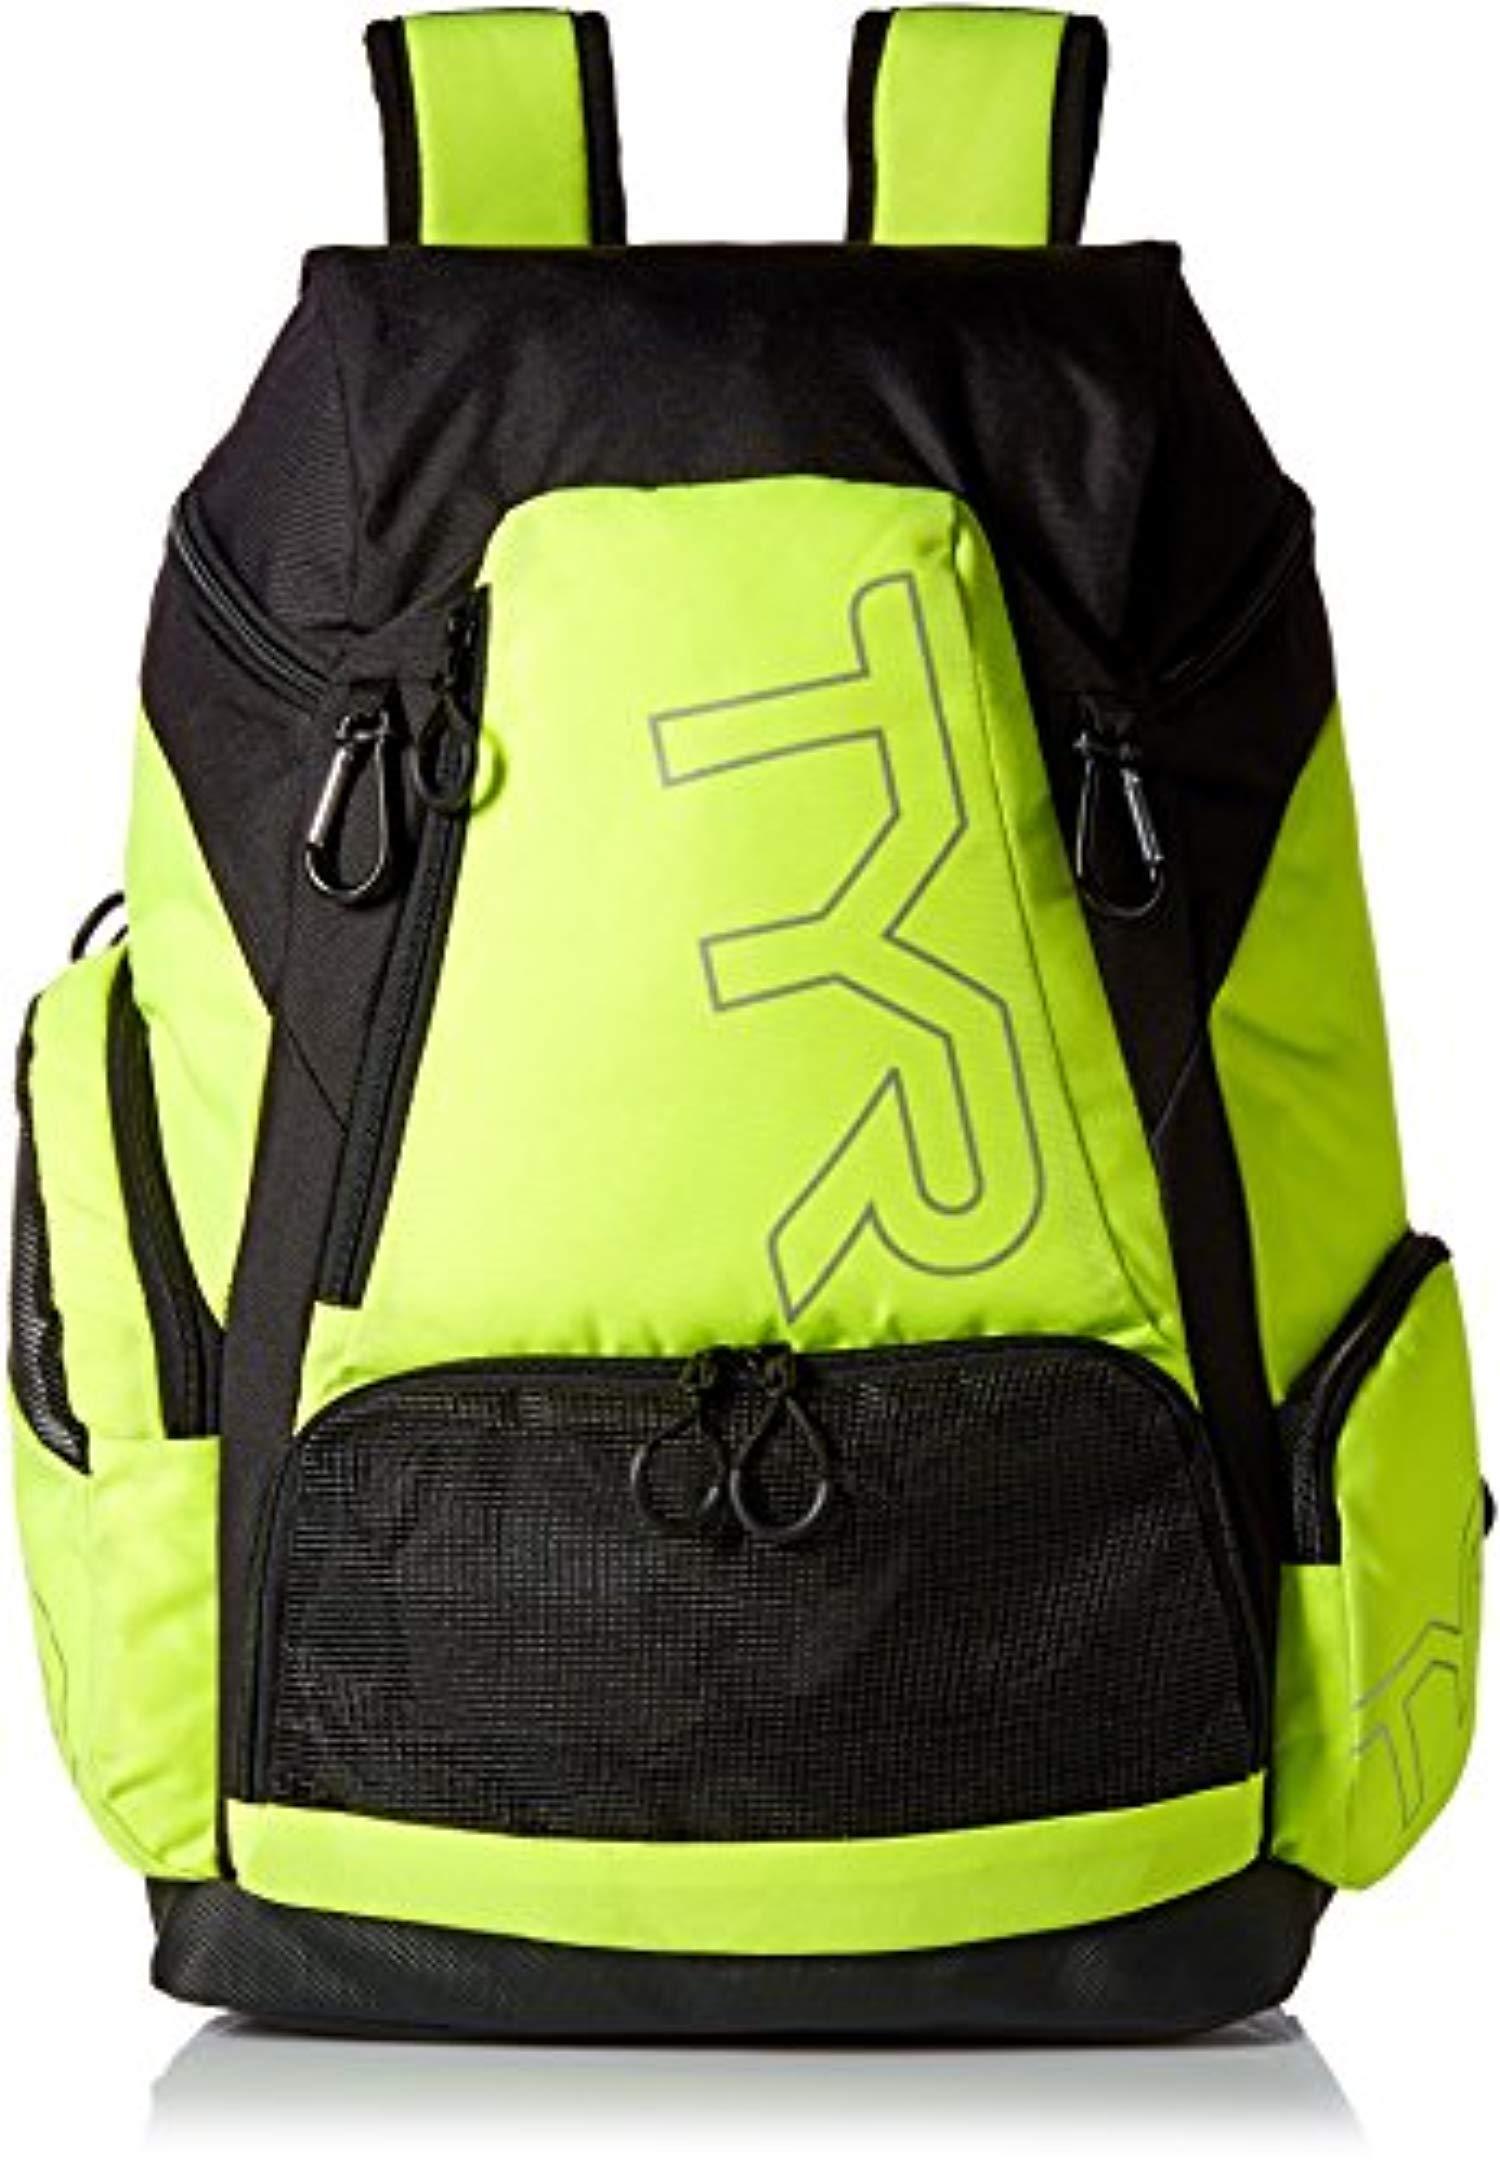 Swim Bundle: TYR Alliance 45L Backpack Fluorescent Yellow All & Swim Earplugs by Competition Swimwear